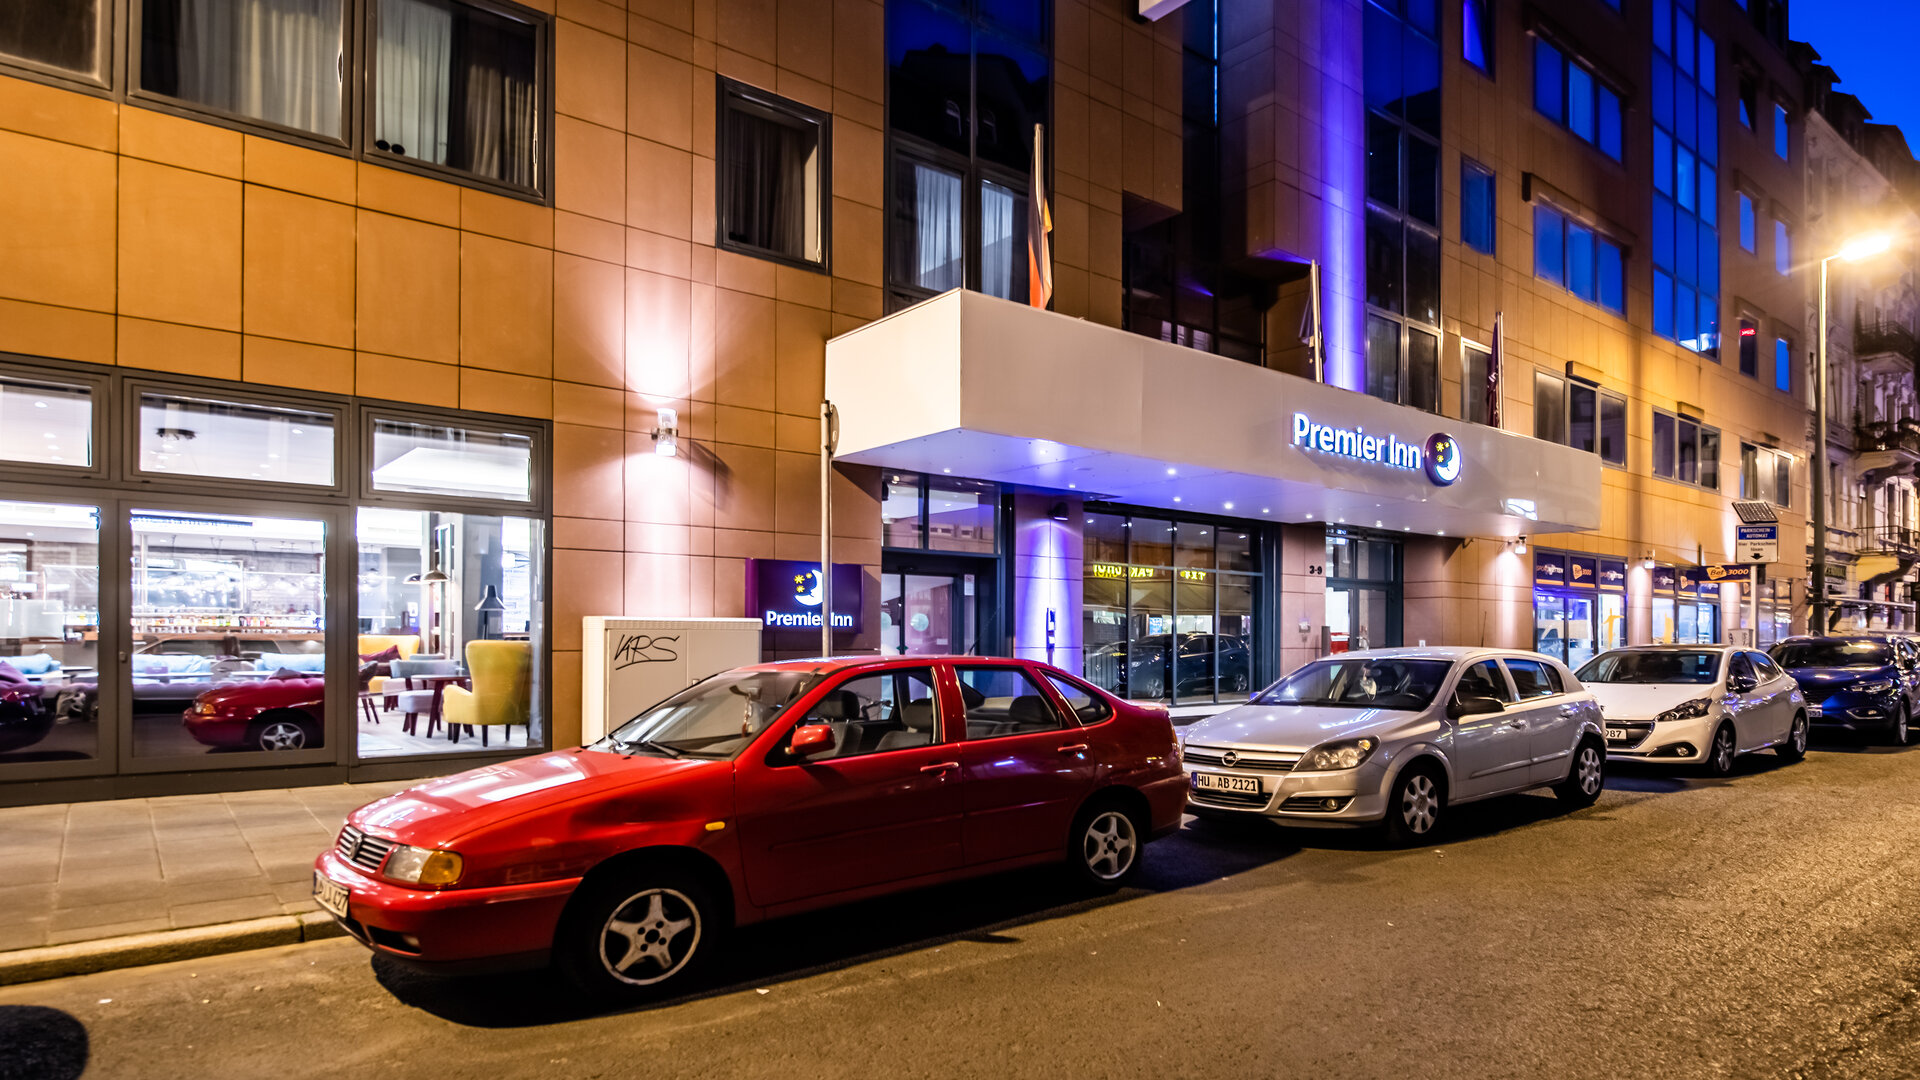 Premier Inn Frankfurt City Hauptbahnhof